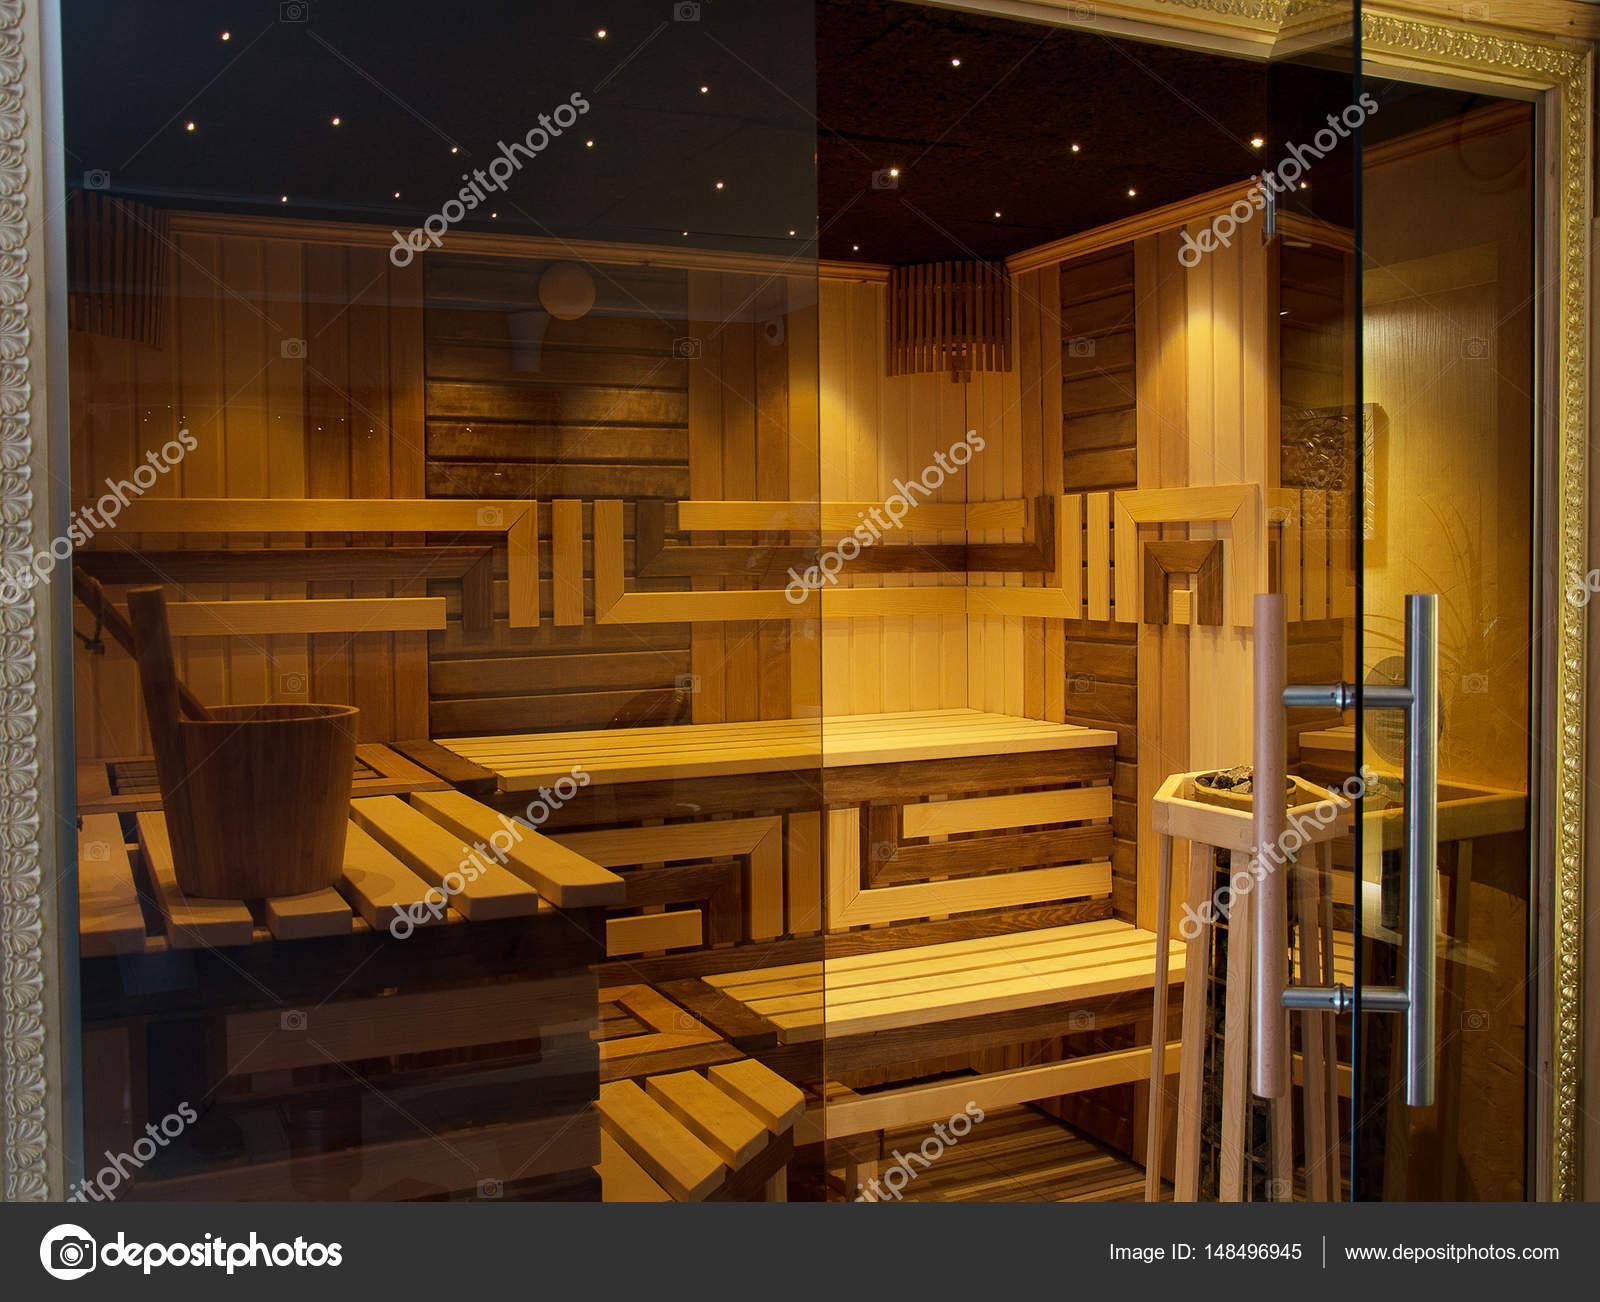 Interior of finnish sauna behind glass door stock photo interior of finnish sauna behind glass door stock photo planetlyrics Image collections